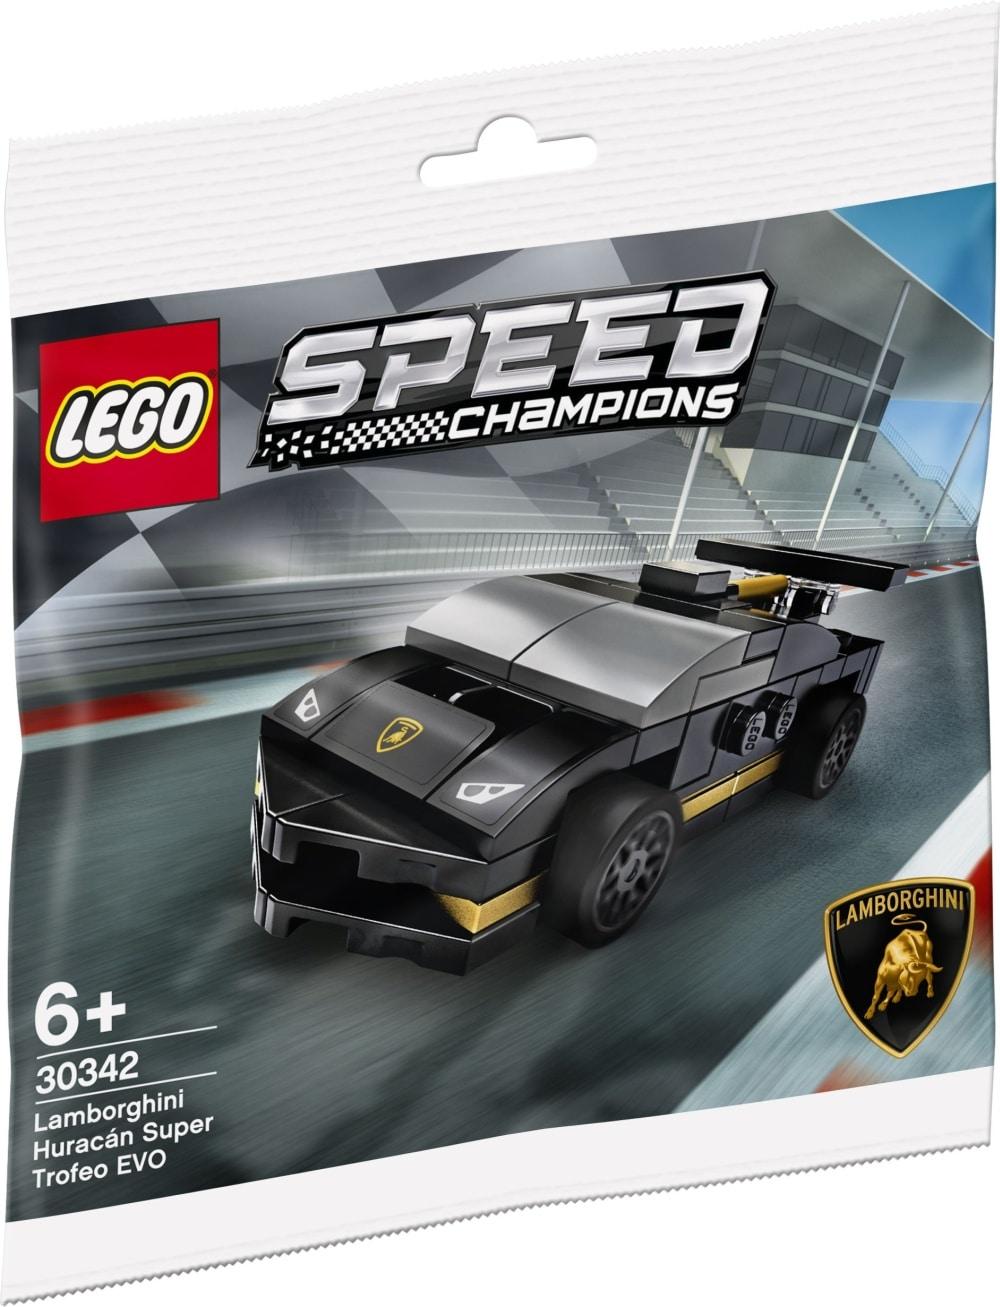 LEGO 30342 Lamborghini Huracan Super Trofeo EVO Polybag